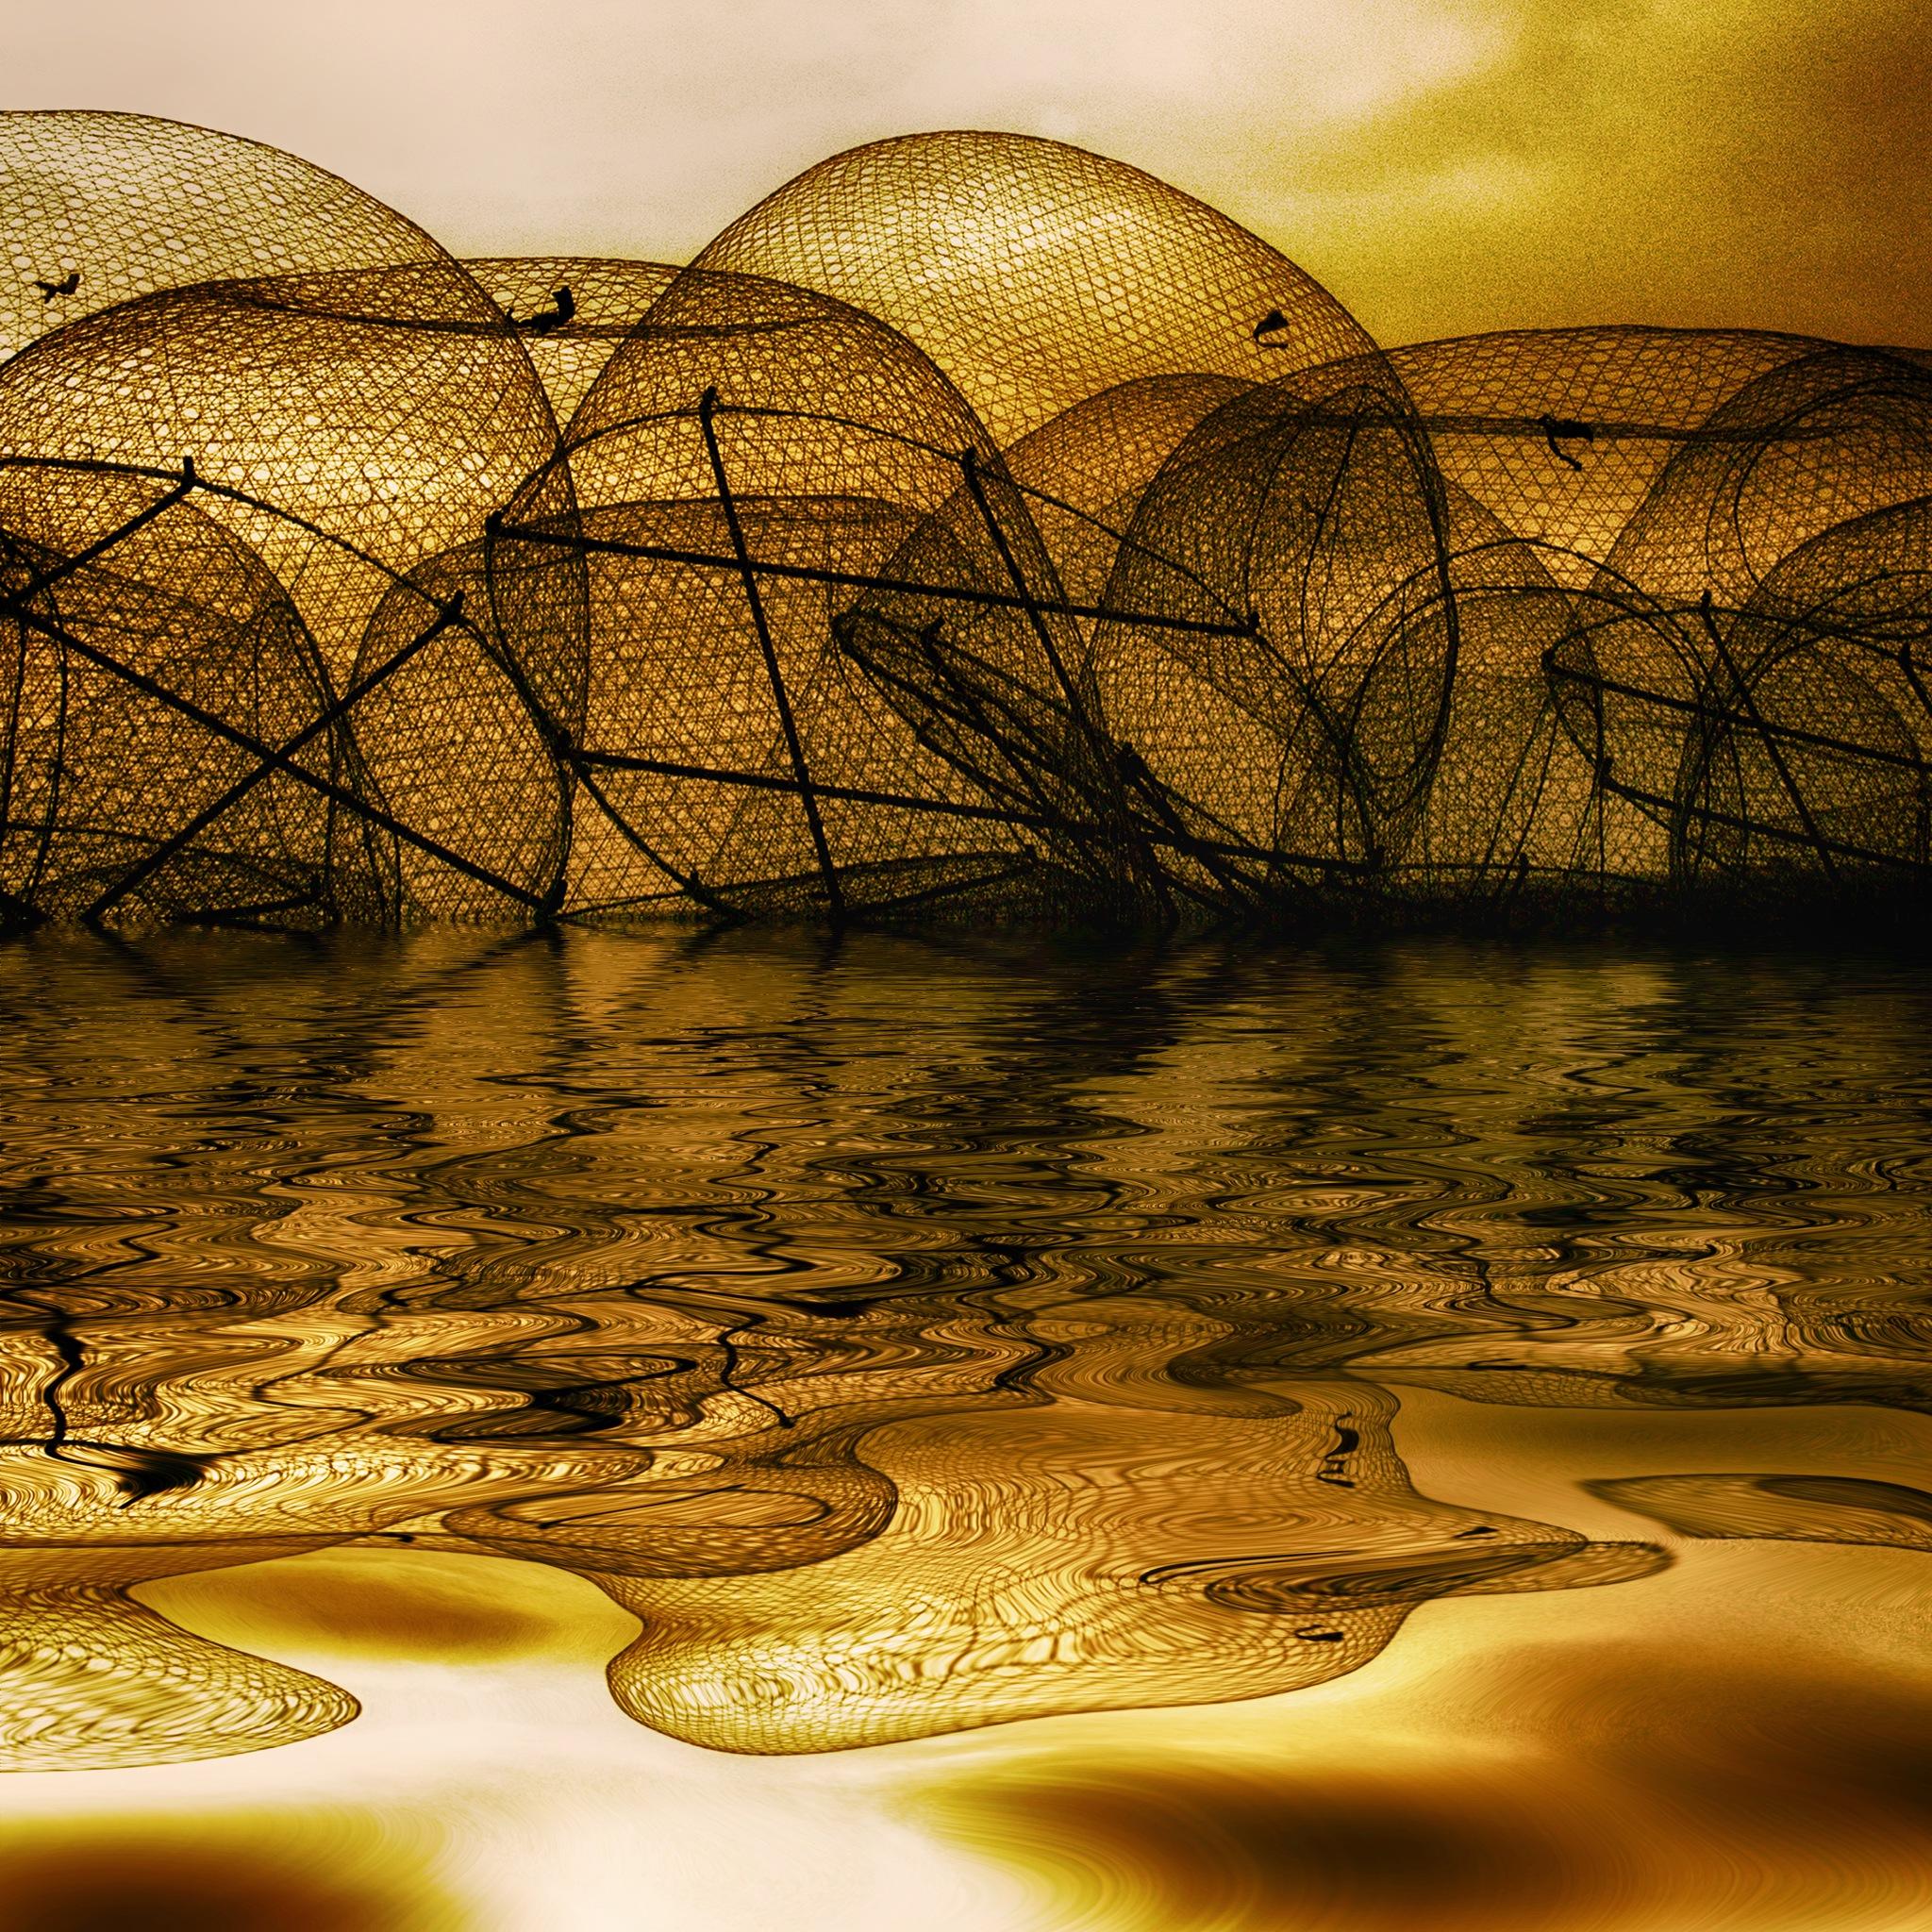 Reflections of a silhouett by Hisham Badran